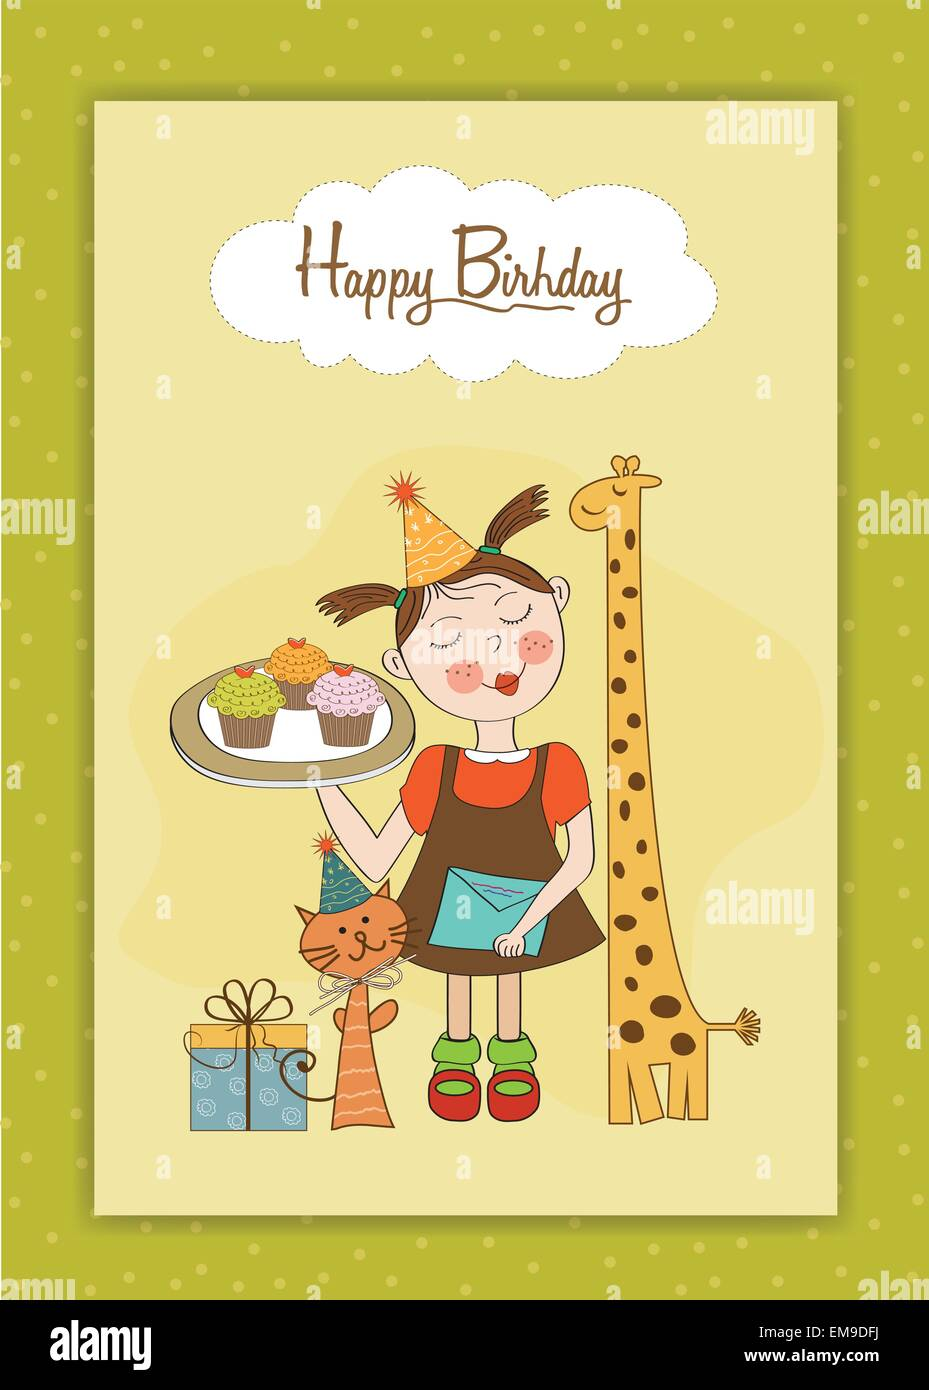 Happy Birthday Funny Girl Images : happy, birthday, funny, images, Happy, Birthday, Funny, Girl,, Animals, Cupcakes, Stock, Vector, Image, Alamy